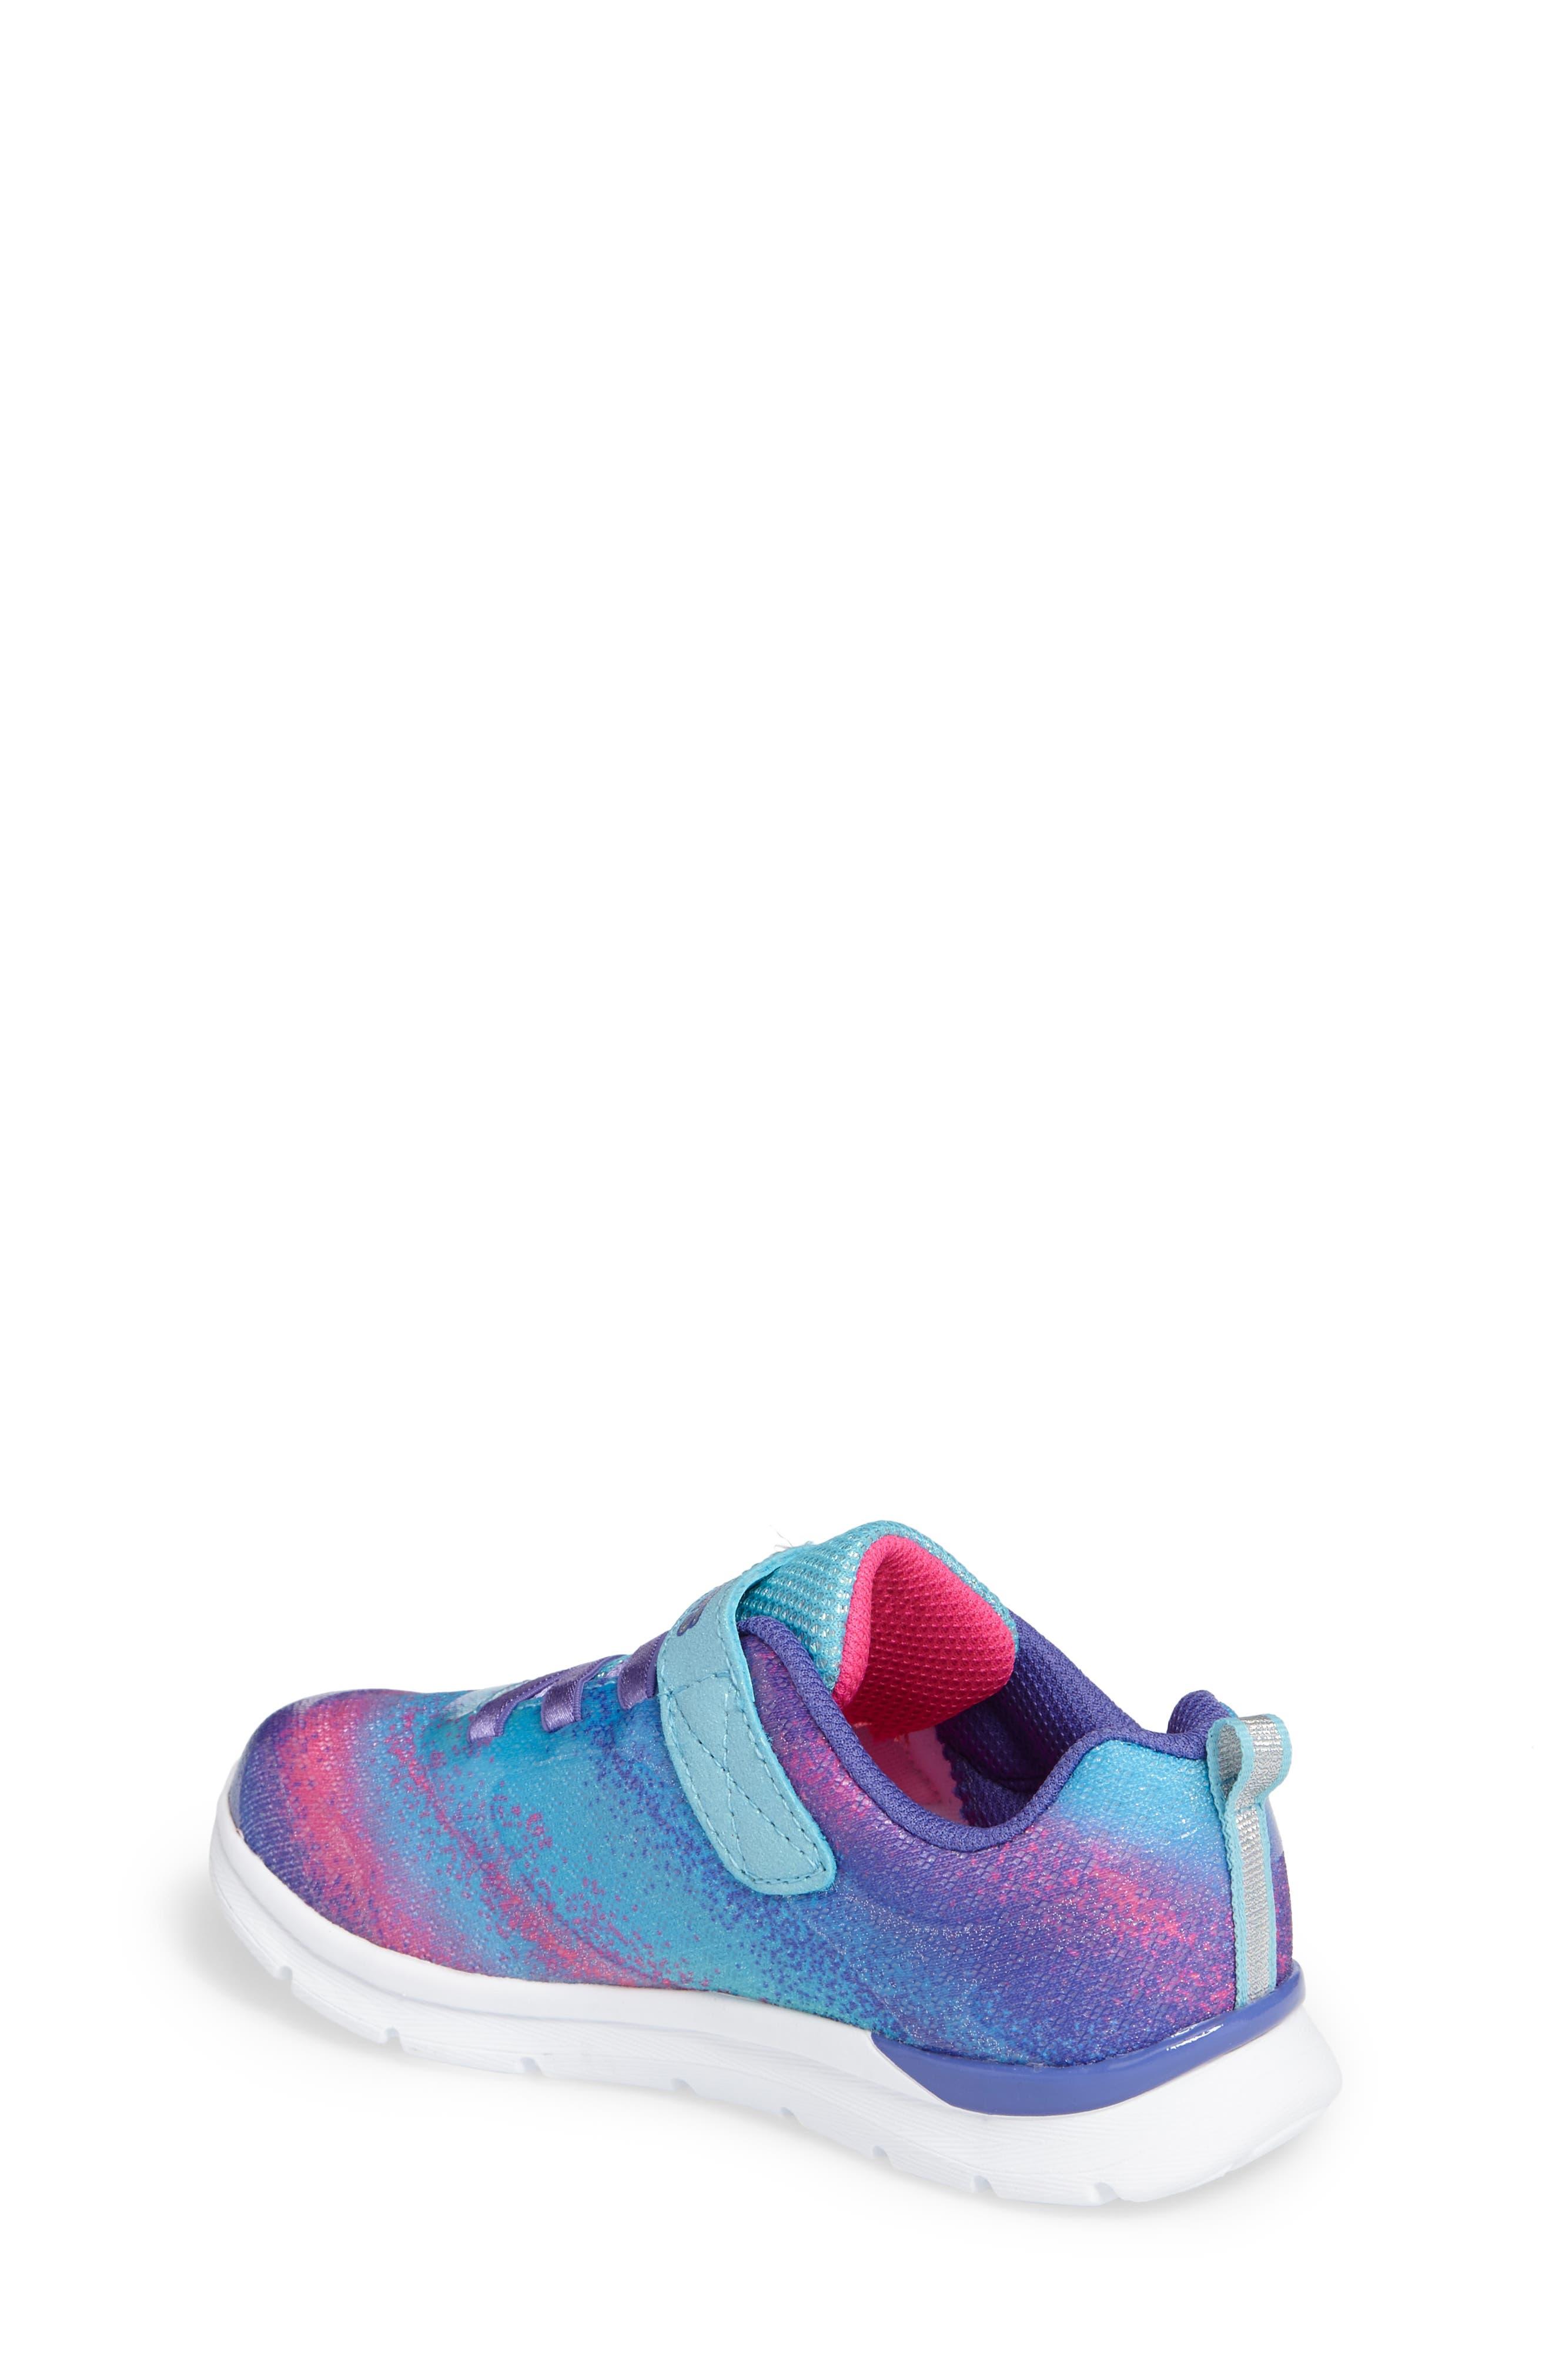 Skech-Lite Colorful Cutie Sneaker,                             Alternate thumbnail 2, color,                             400